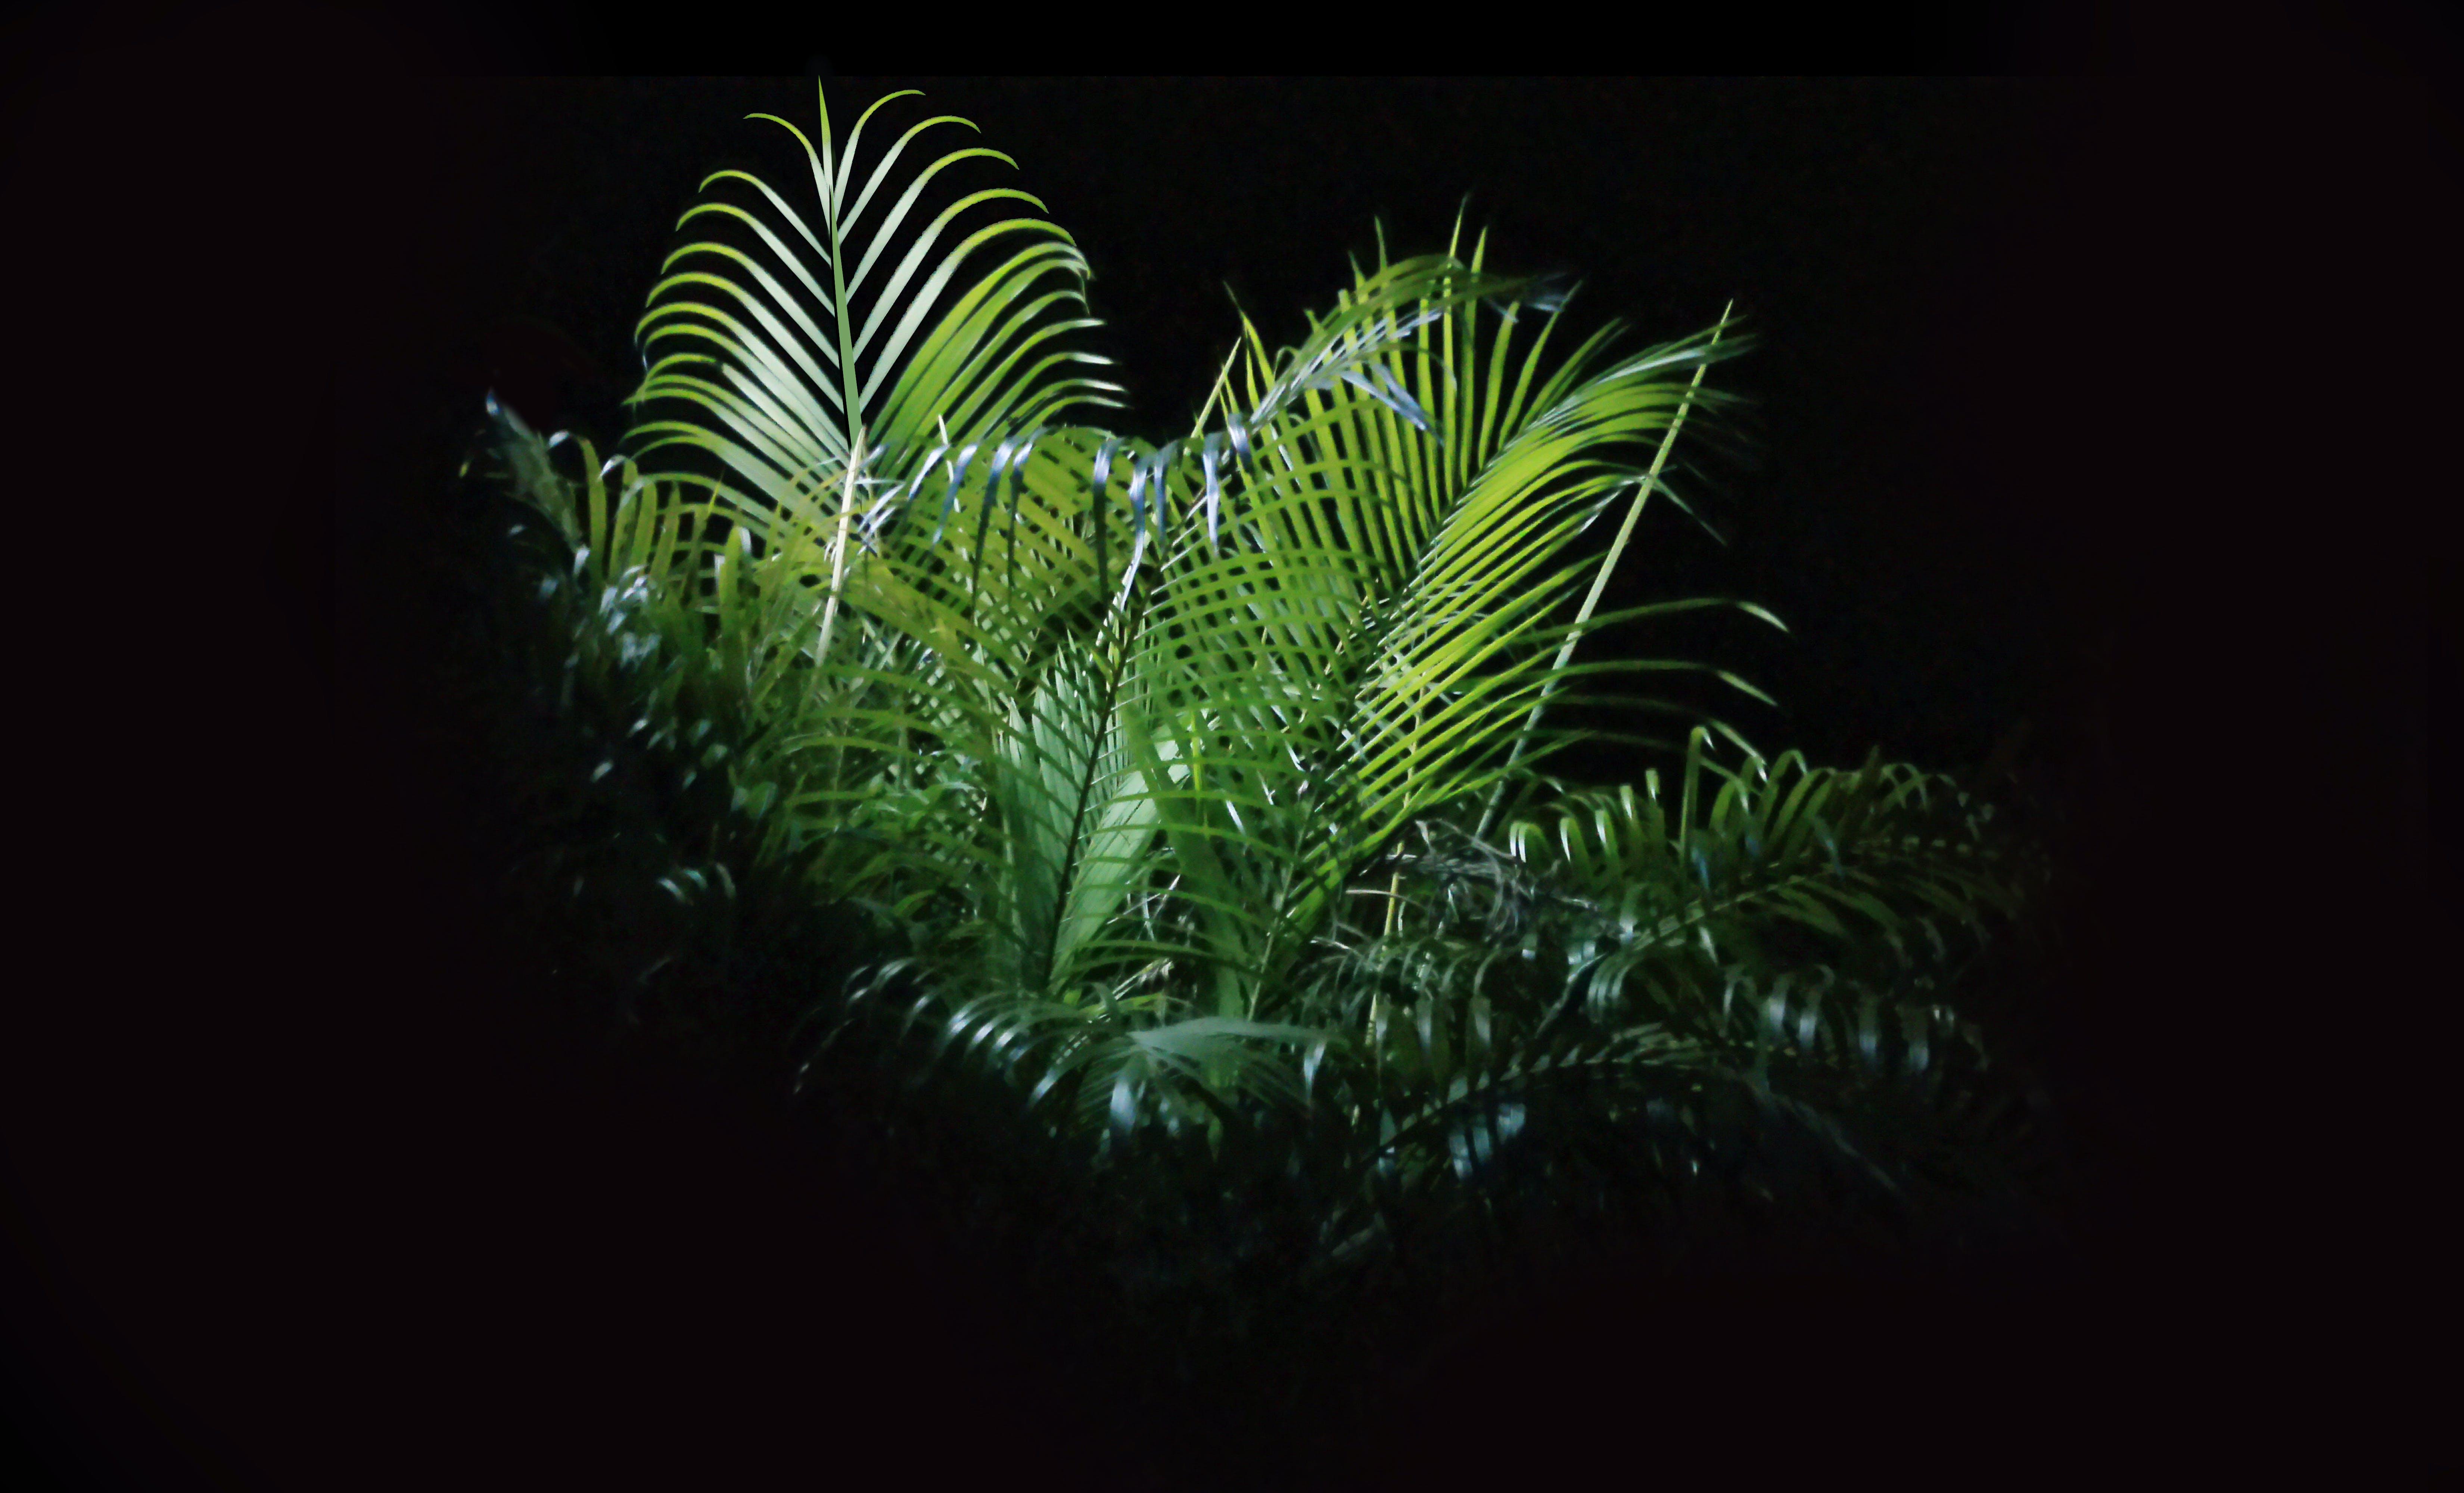 Macro Photo of Fern Plant